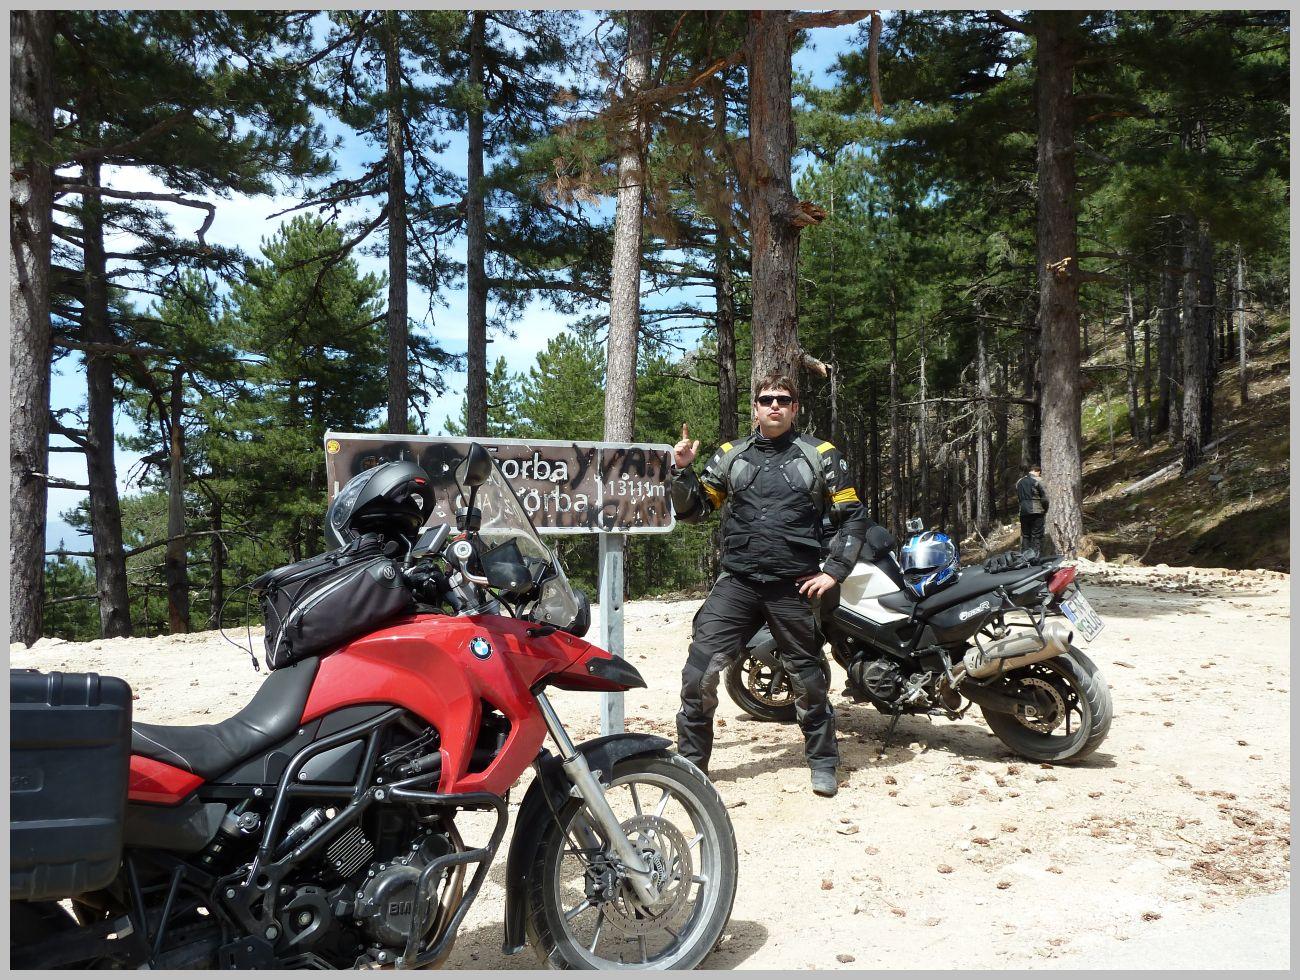 201206_Korsika_Moped114